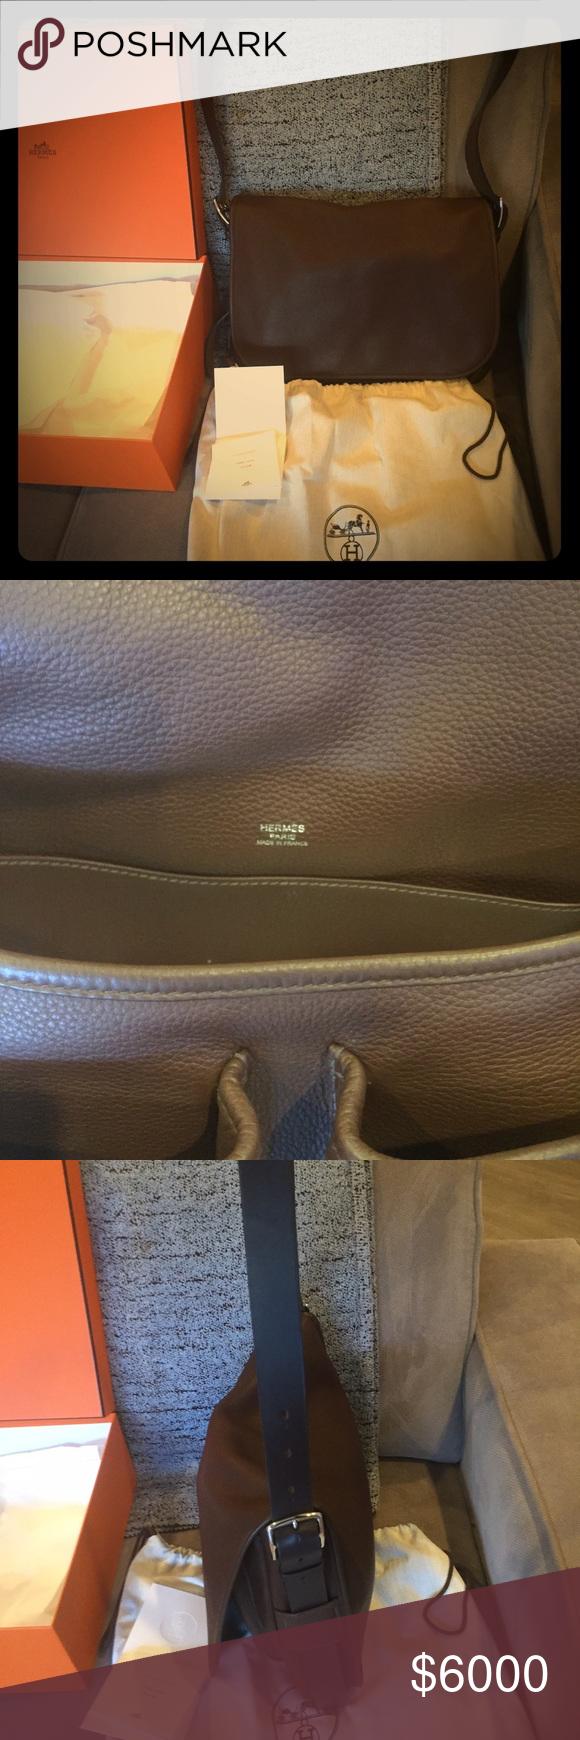 1ebf8b332a94 shop hermès birkin 35 leather handbag 97796 ffae8  france hermes evelyne bag  prices hermes barda 43 messenger bag hermes sikkim calfskin leather barda 43